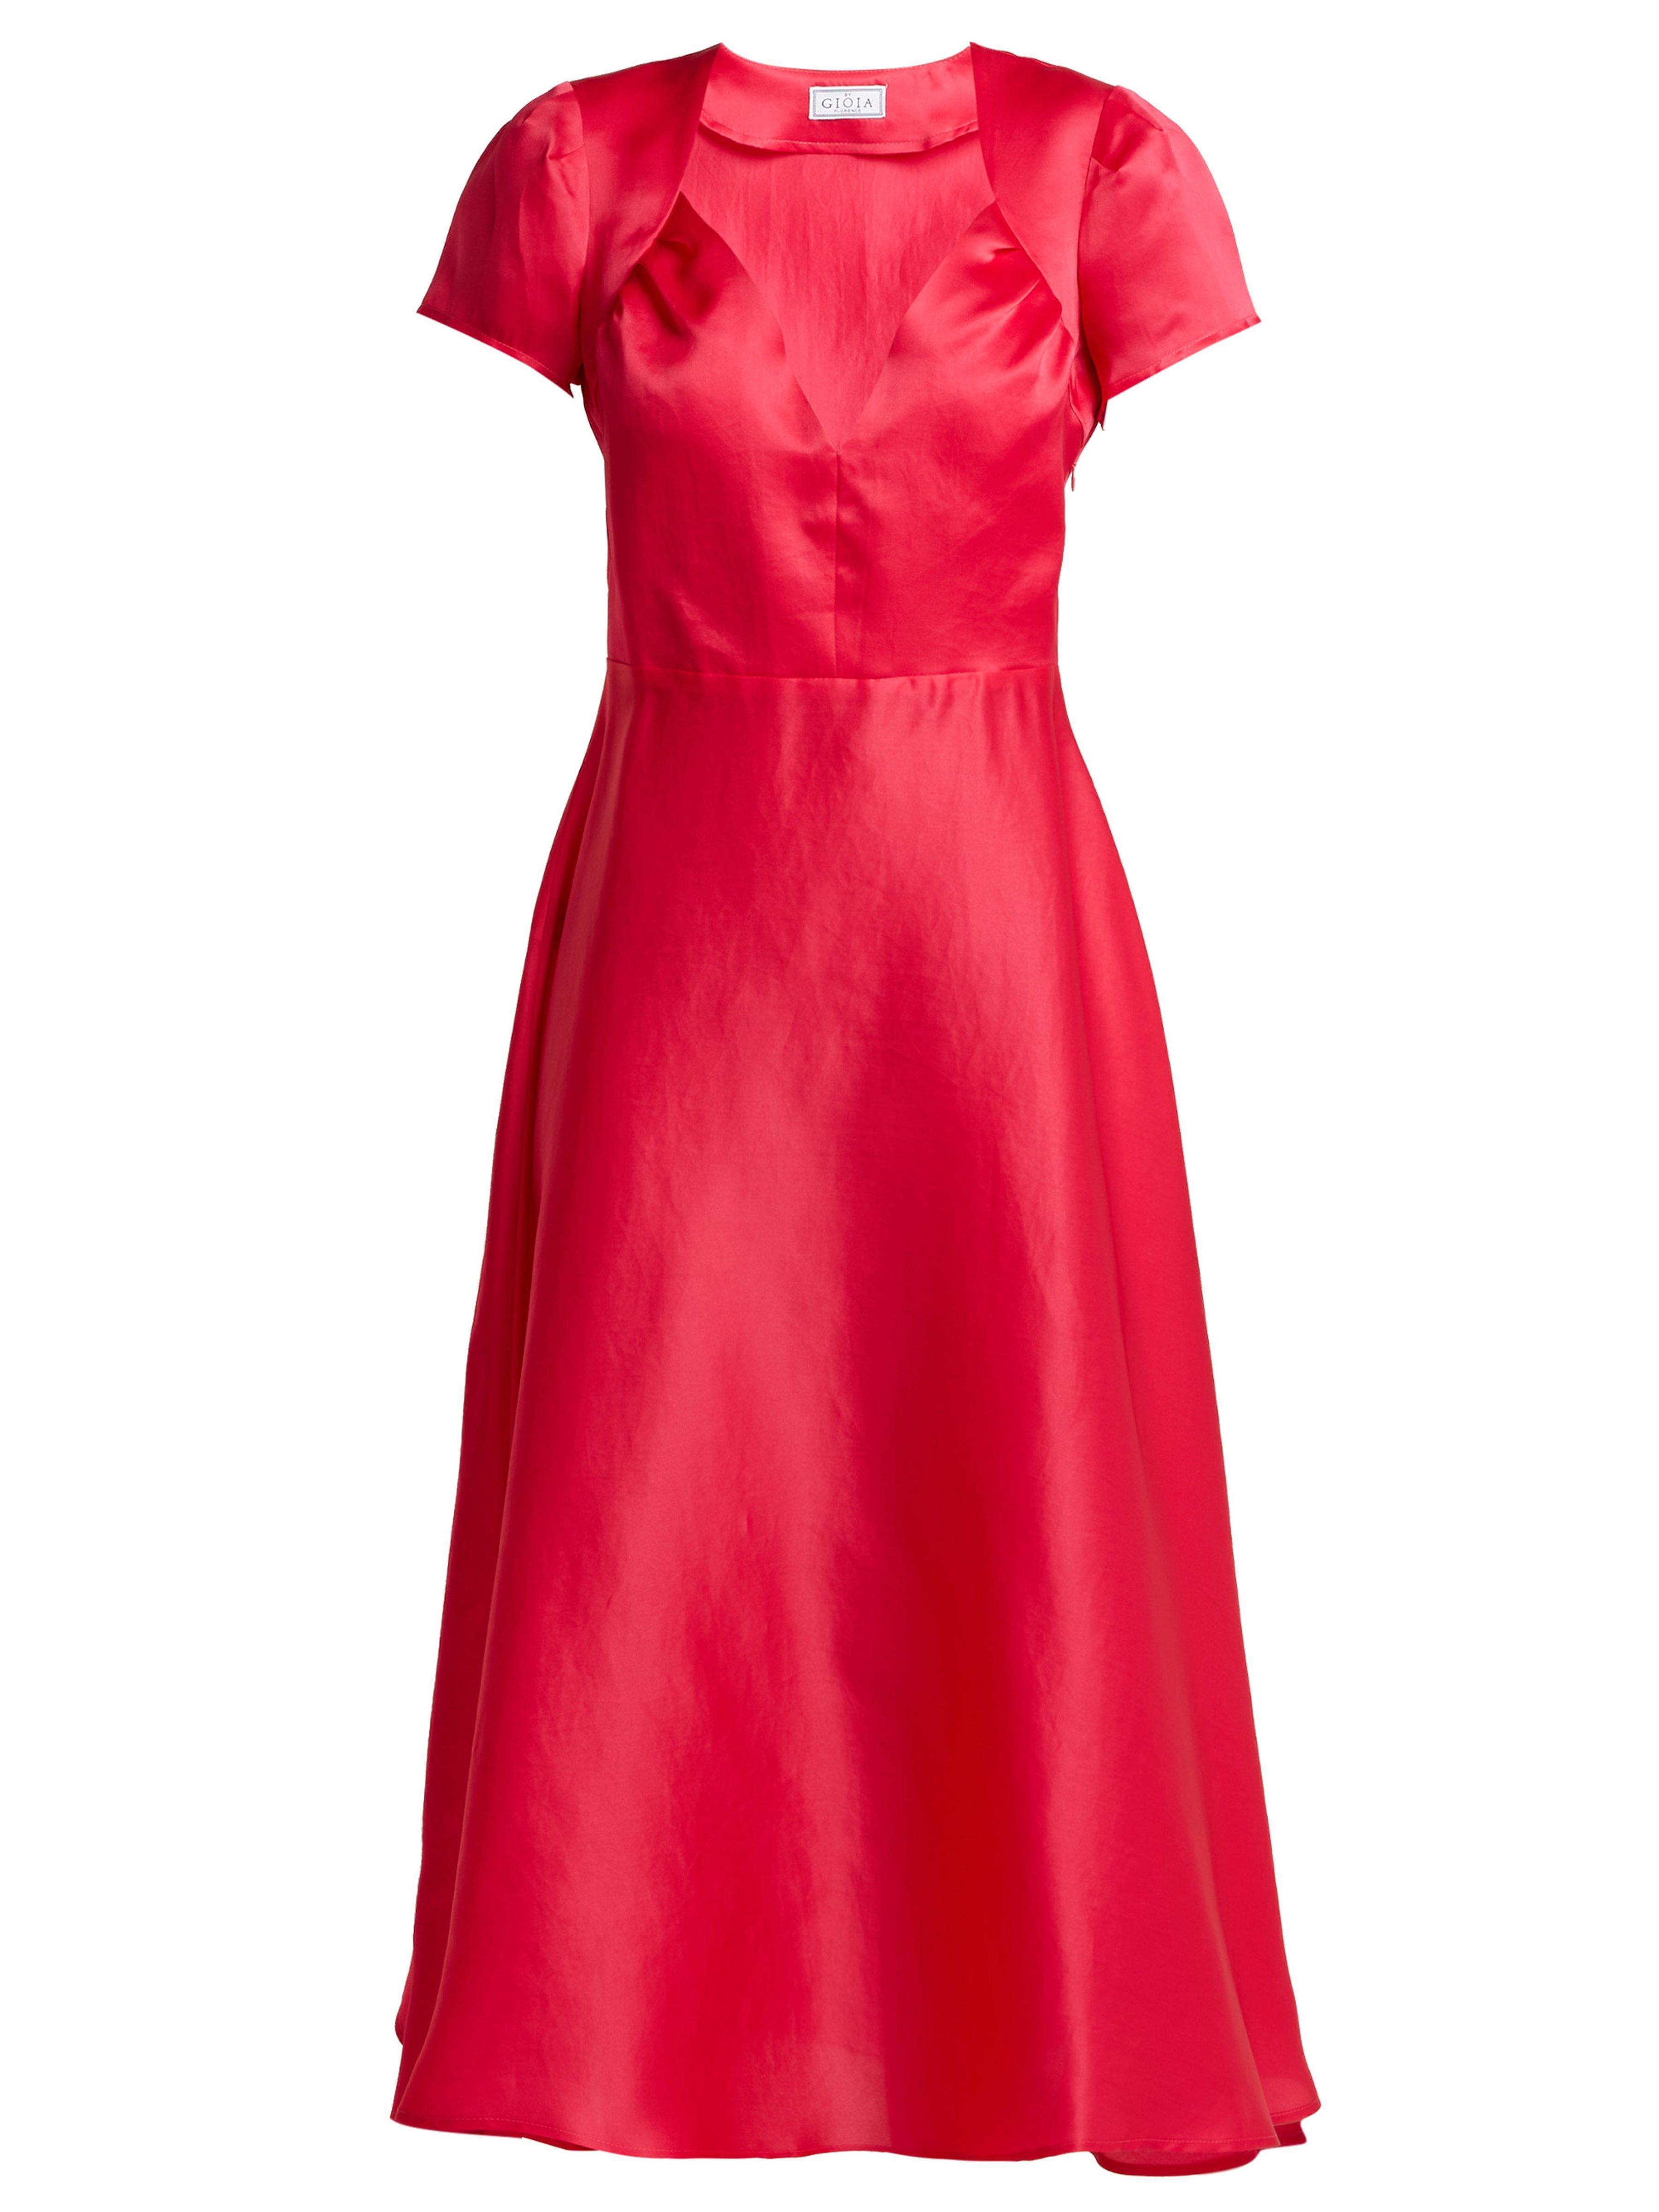 2824a6d0e7 Gioia Bini Tina Silk Dress in Pink - Lyst